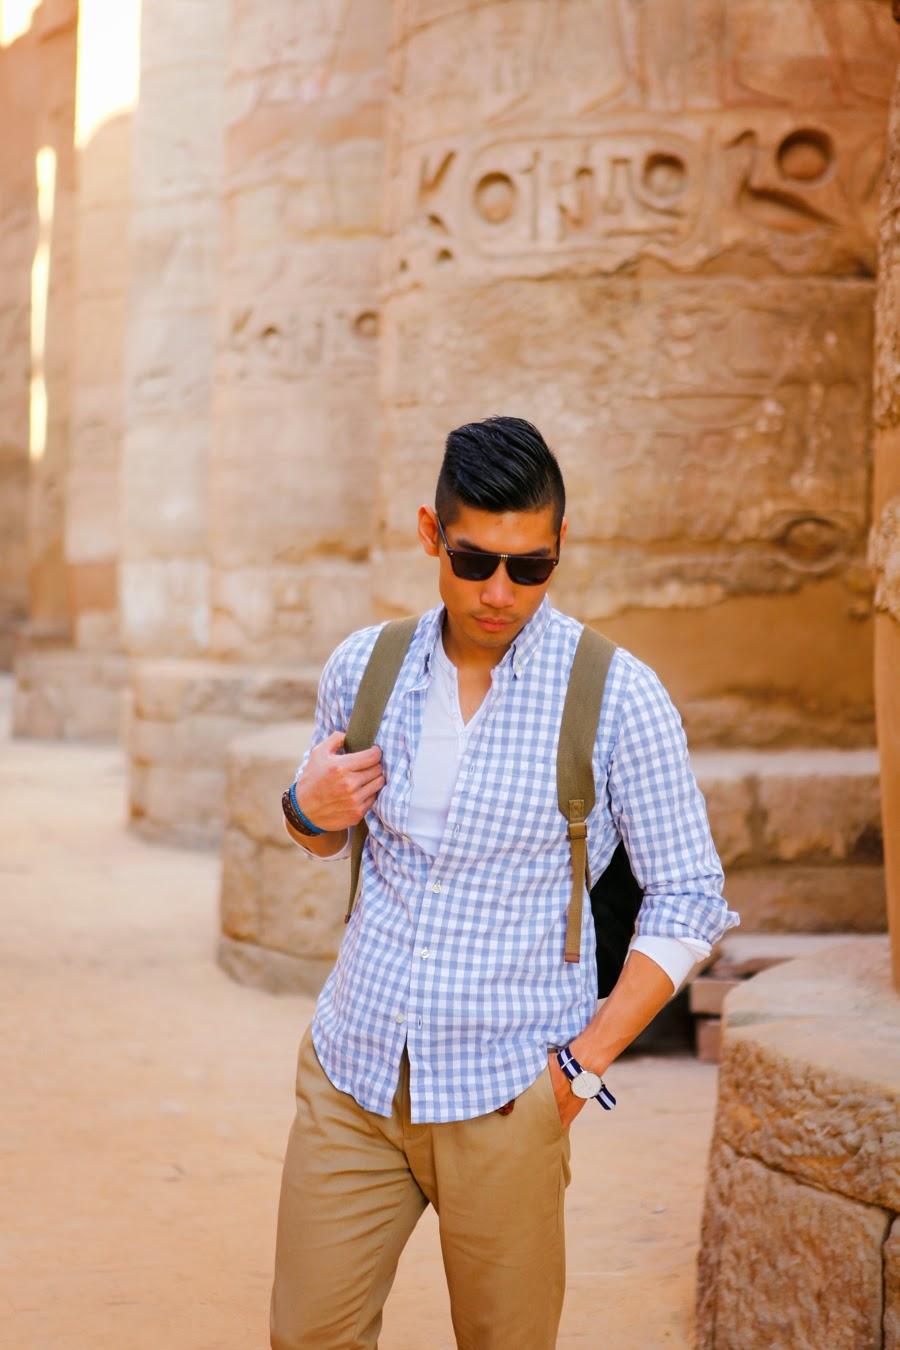 Levitate Style - Luxor, Egypt, Karnack Temple